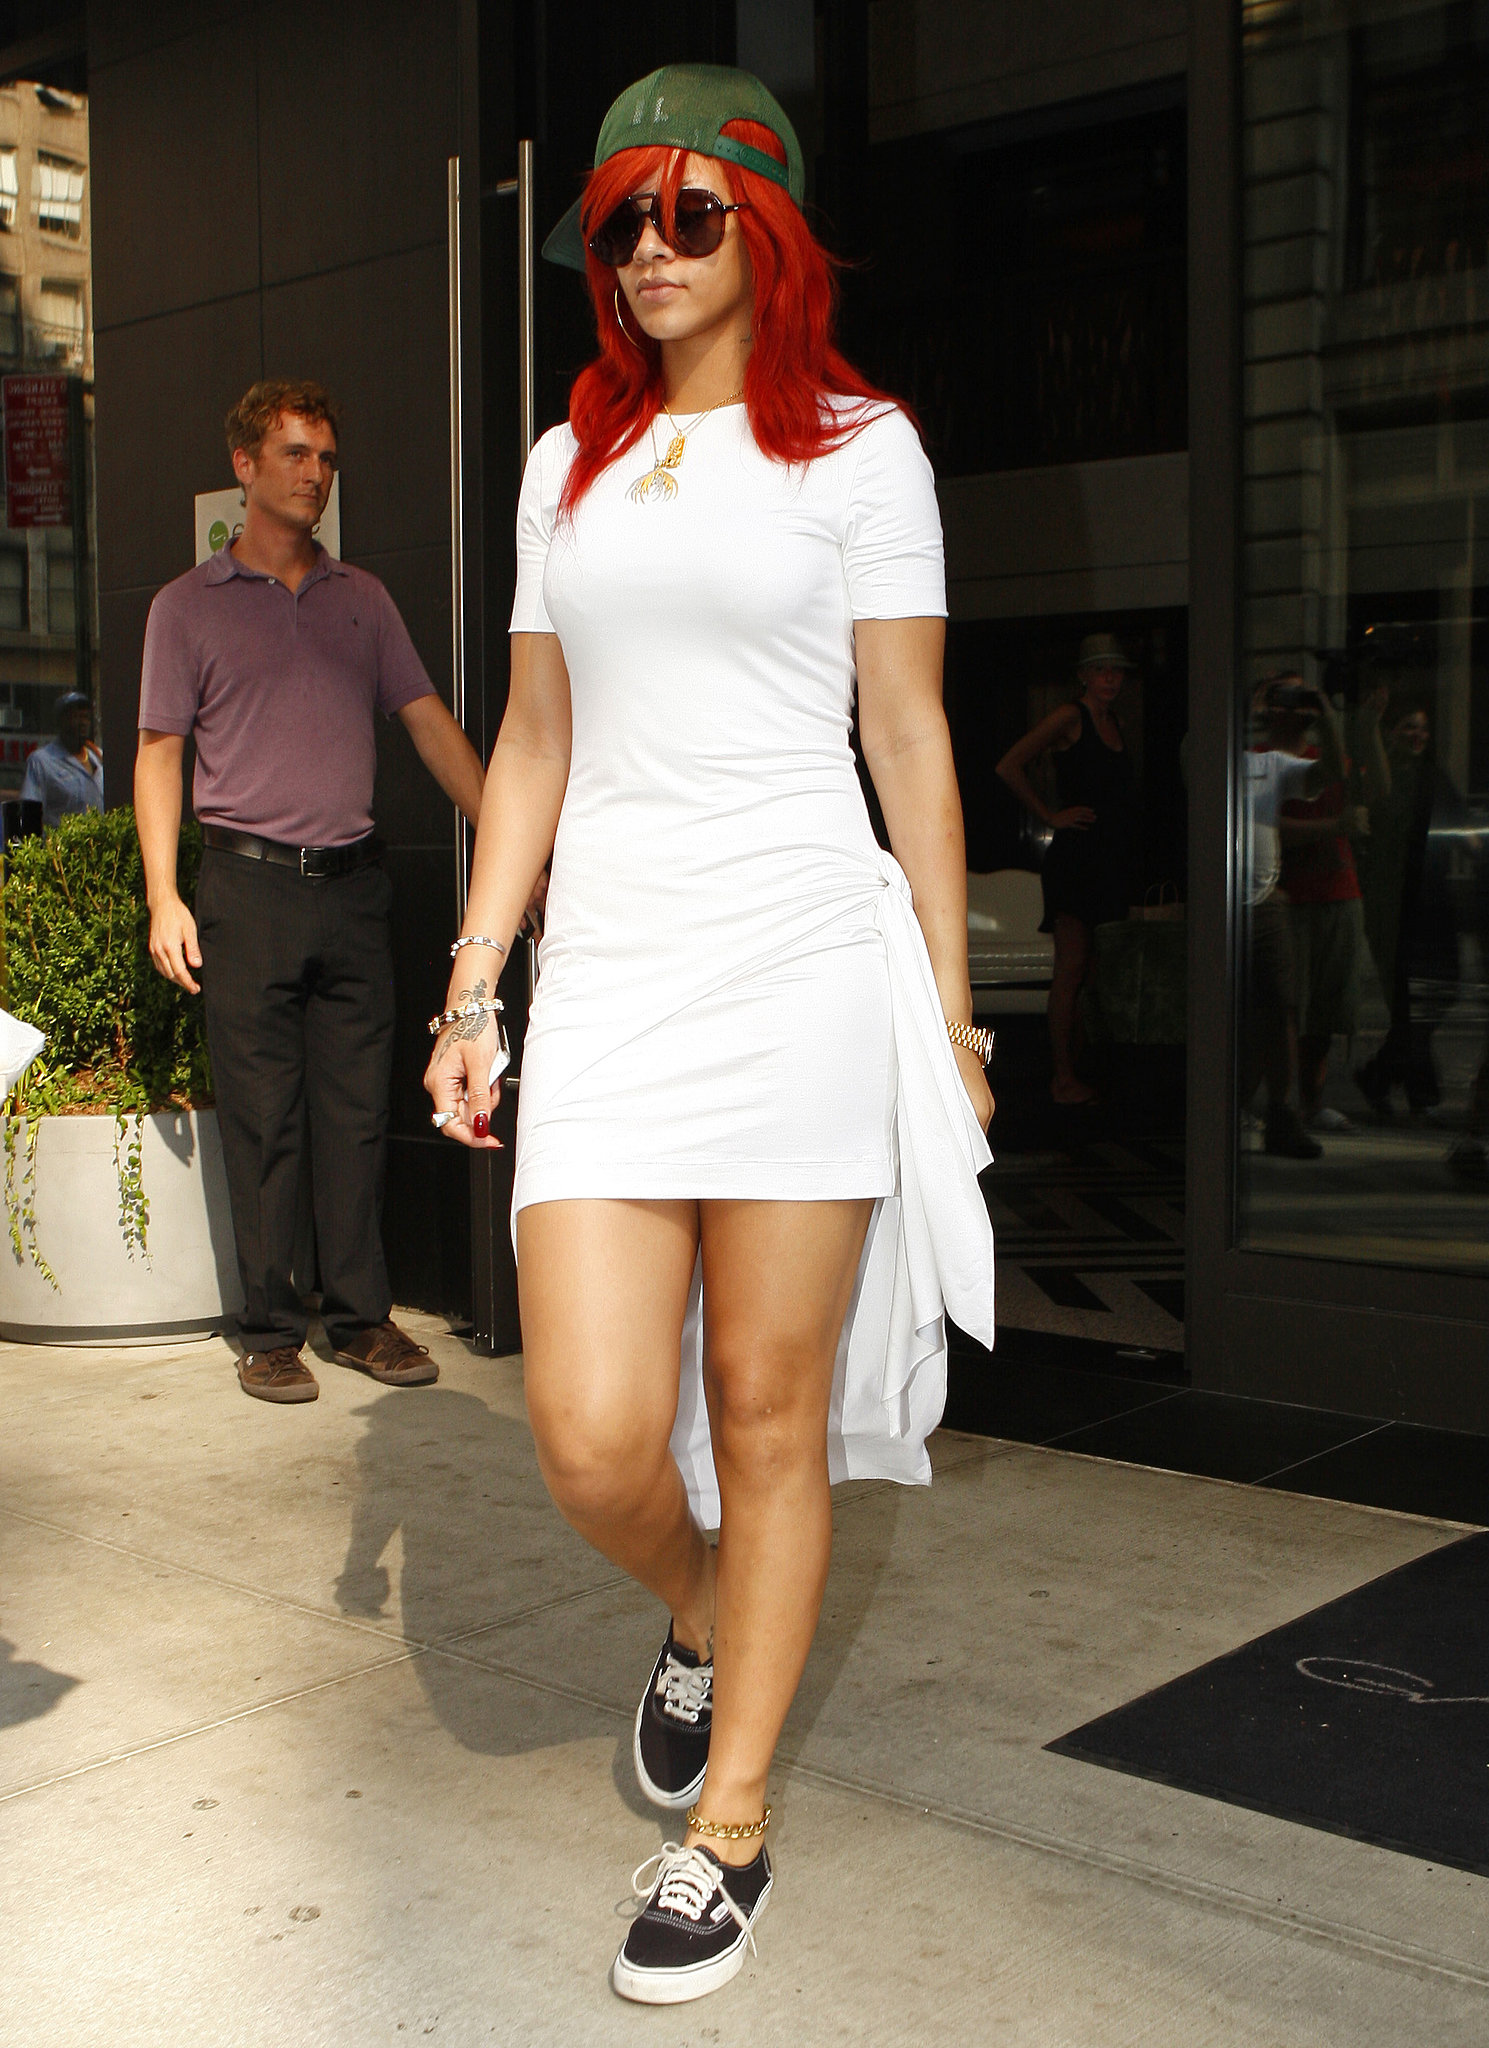 White t shirt dress outfit - Dress Up A Black T Shirt